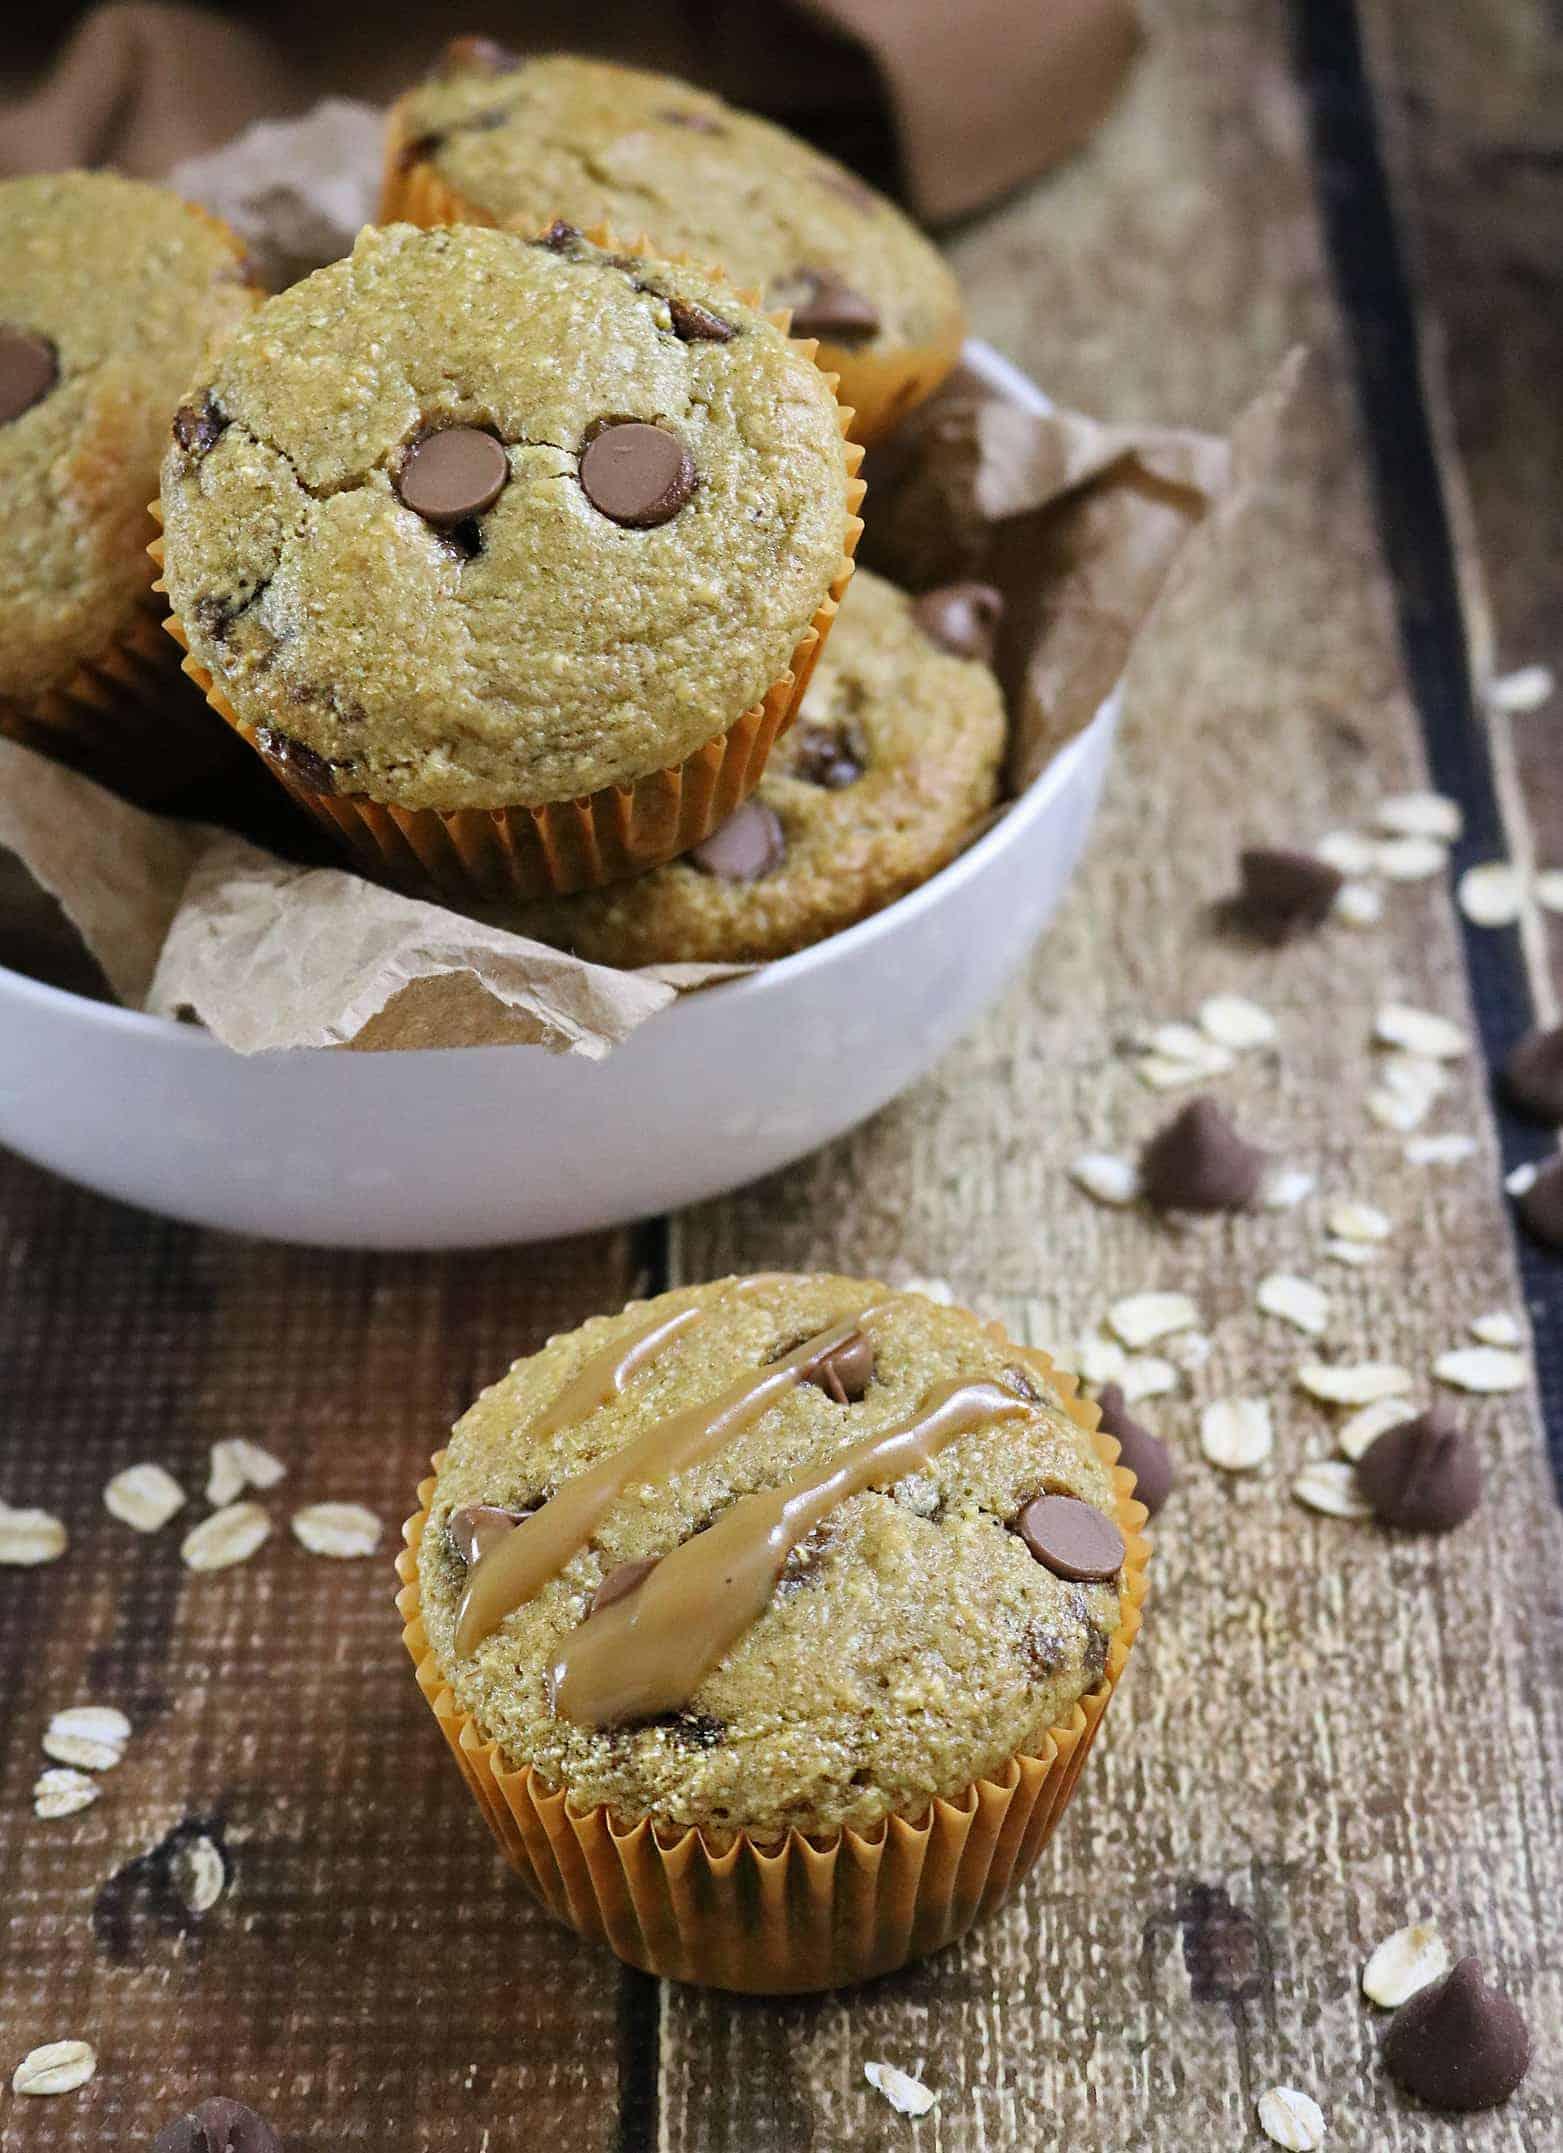 Gluten free Caramel Chocolate Muffins And Iced Caramel Mocha